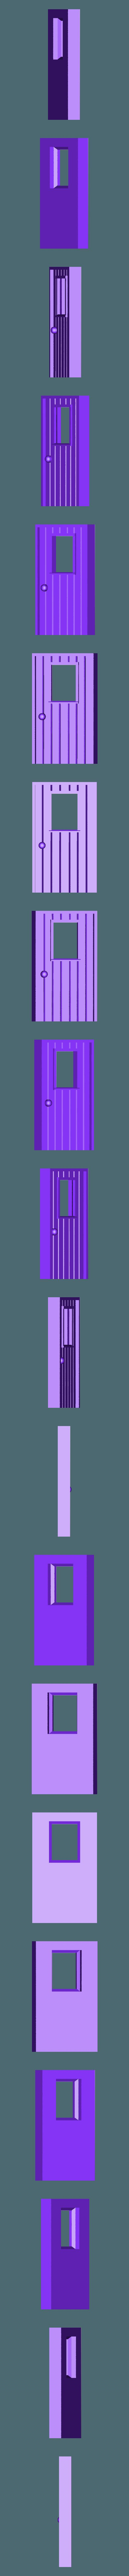 IPAD_DOOR.stl Download free STL file IPAD STAND (STEAM ENGINE) • 3D printing object, cmtm